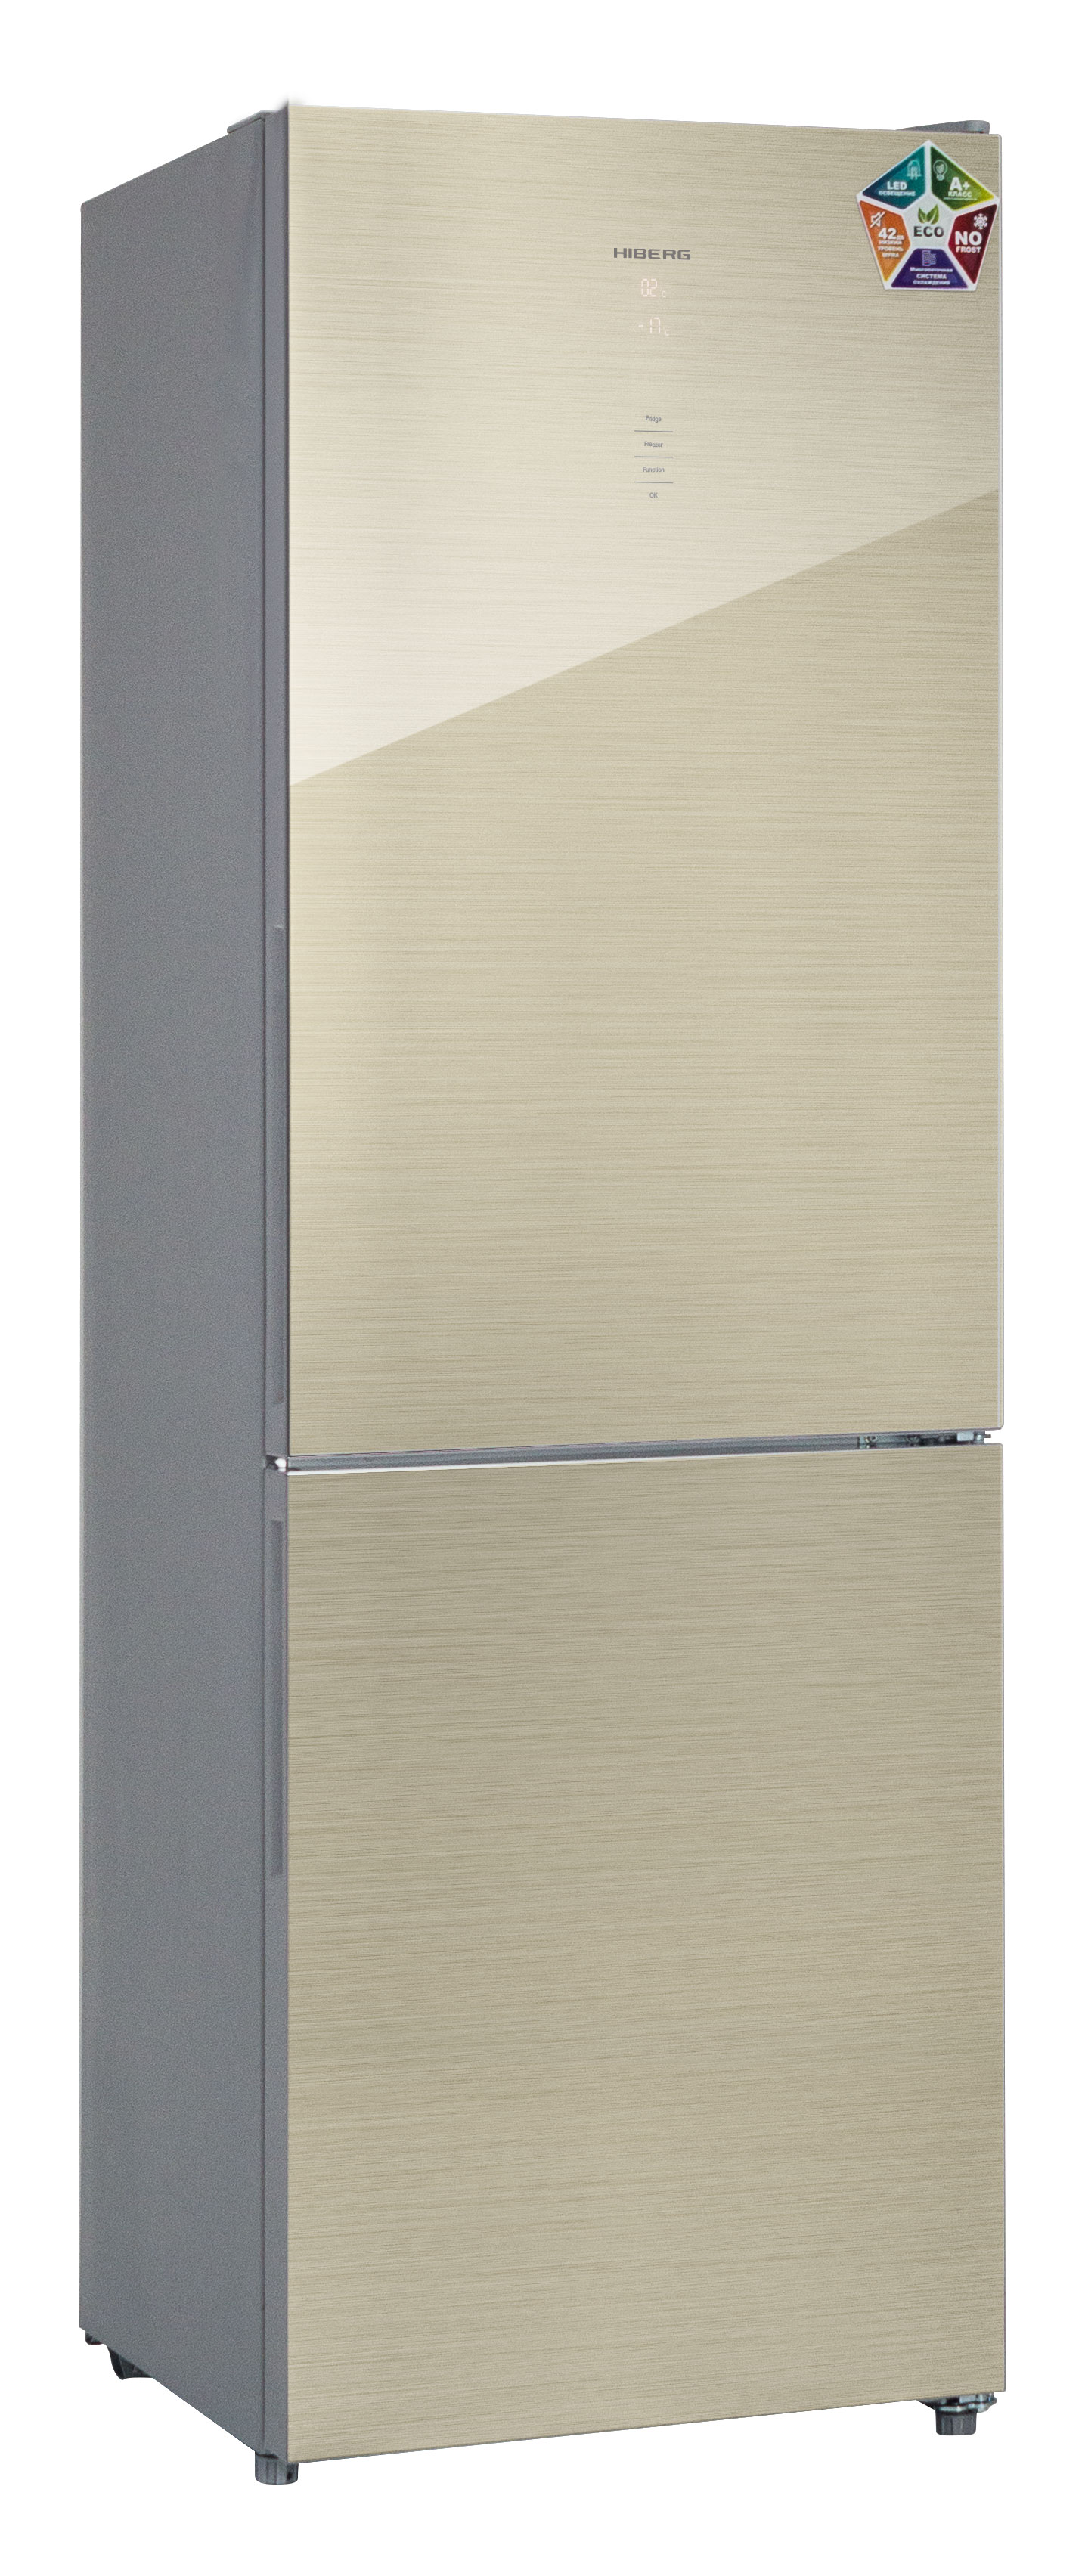 Холодильник HIBERG RFC-311DX NFGJ, шампань line